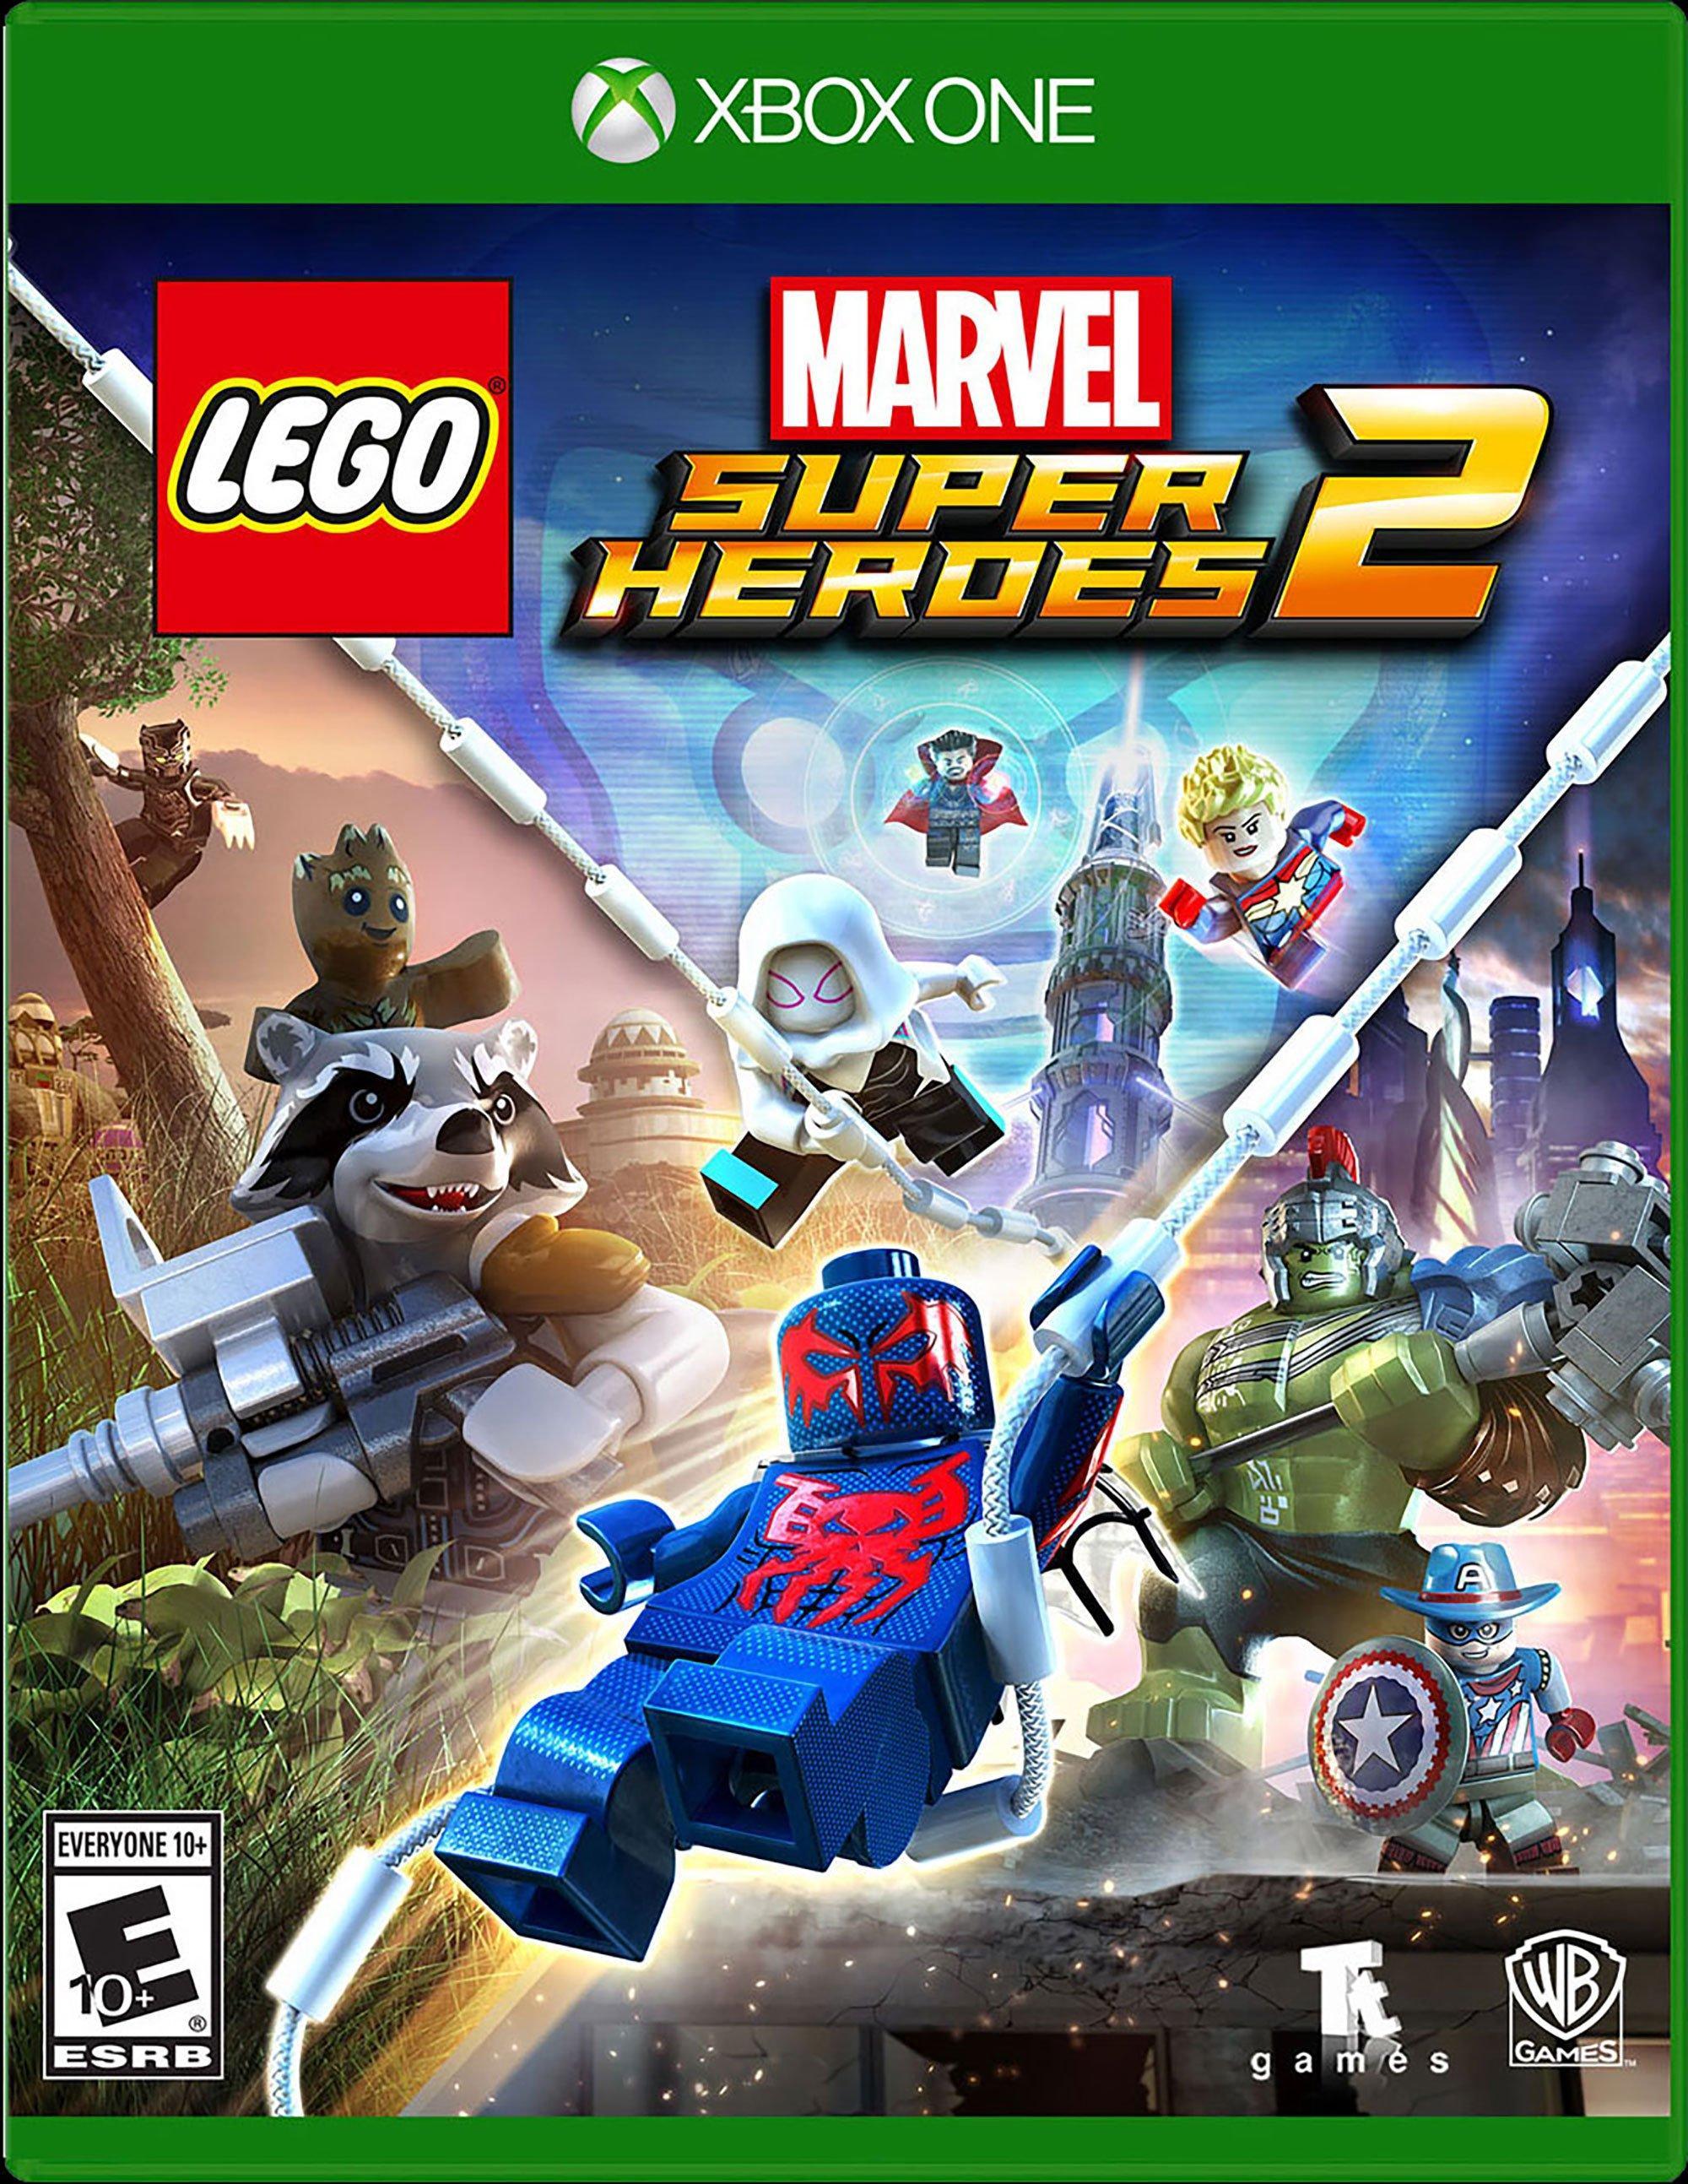 LEGO Marvel Super Heroes 2 | Xbox One | GameStop